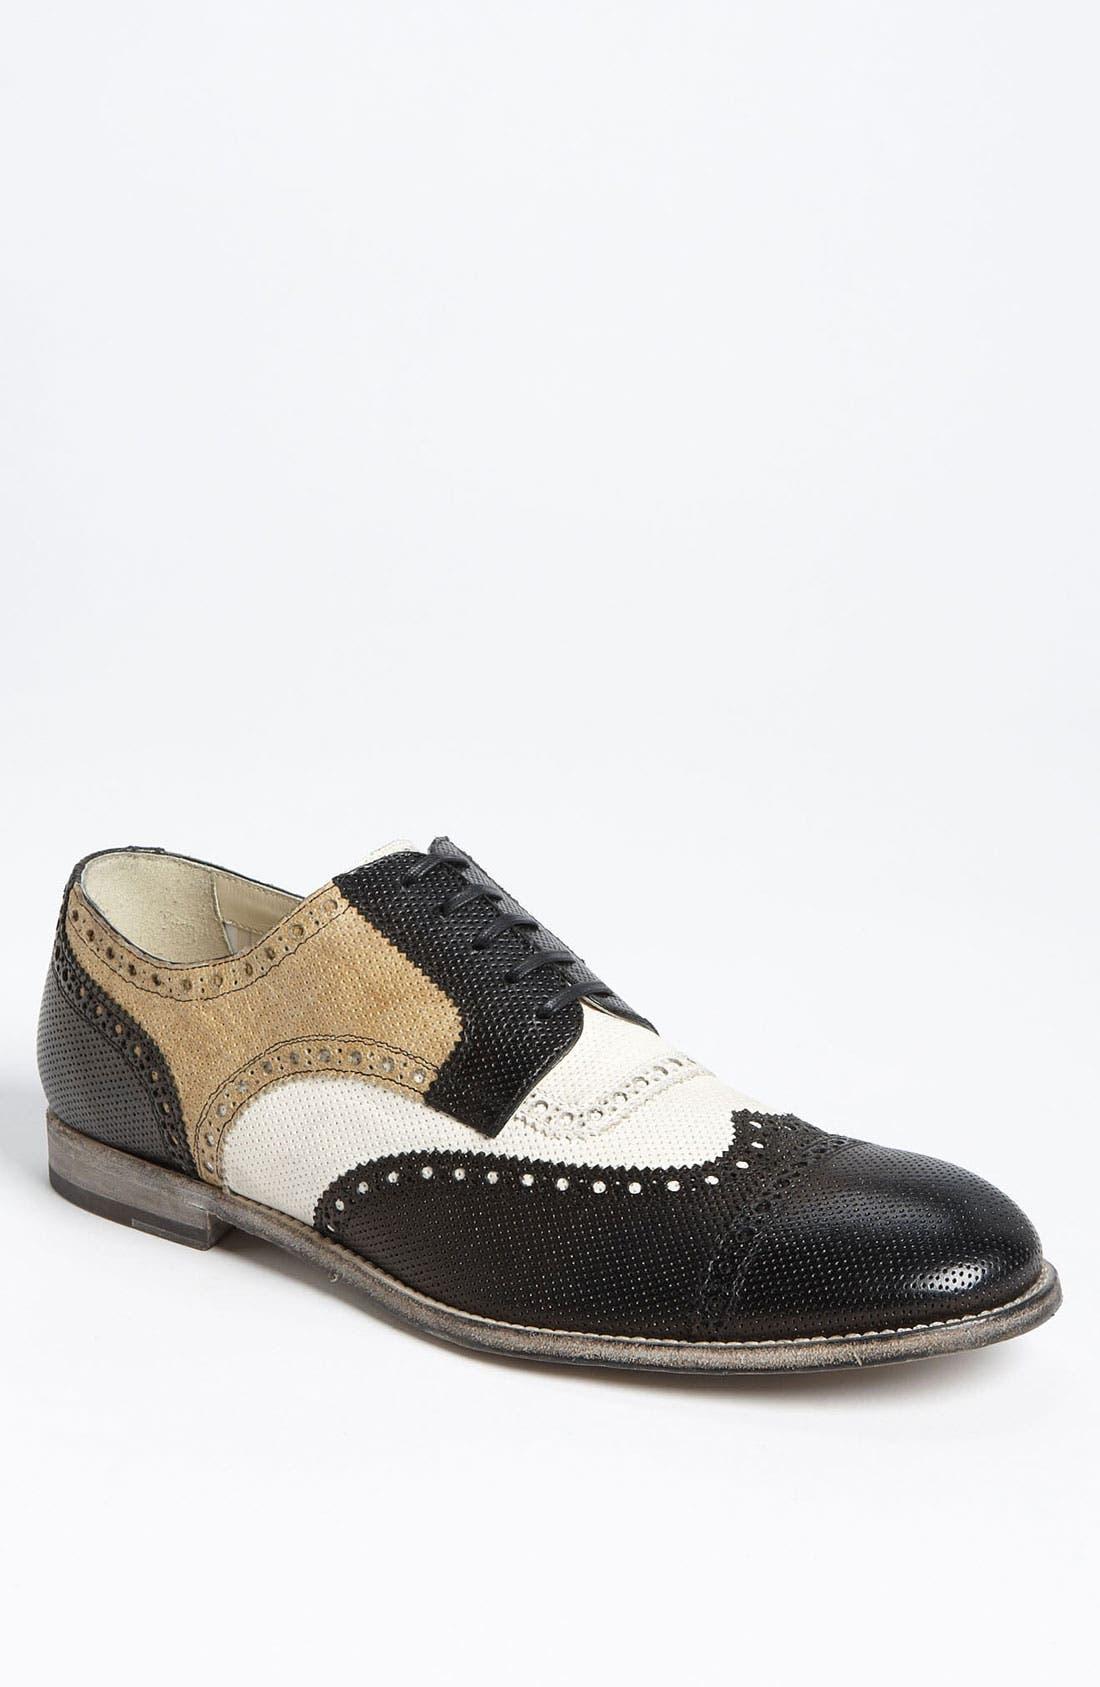 Alternate Image 1 Selected - Dolce&Gabbana Perforated Spectator Shoe